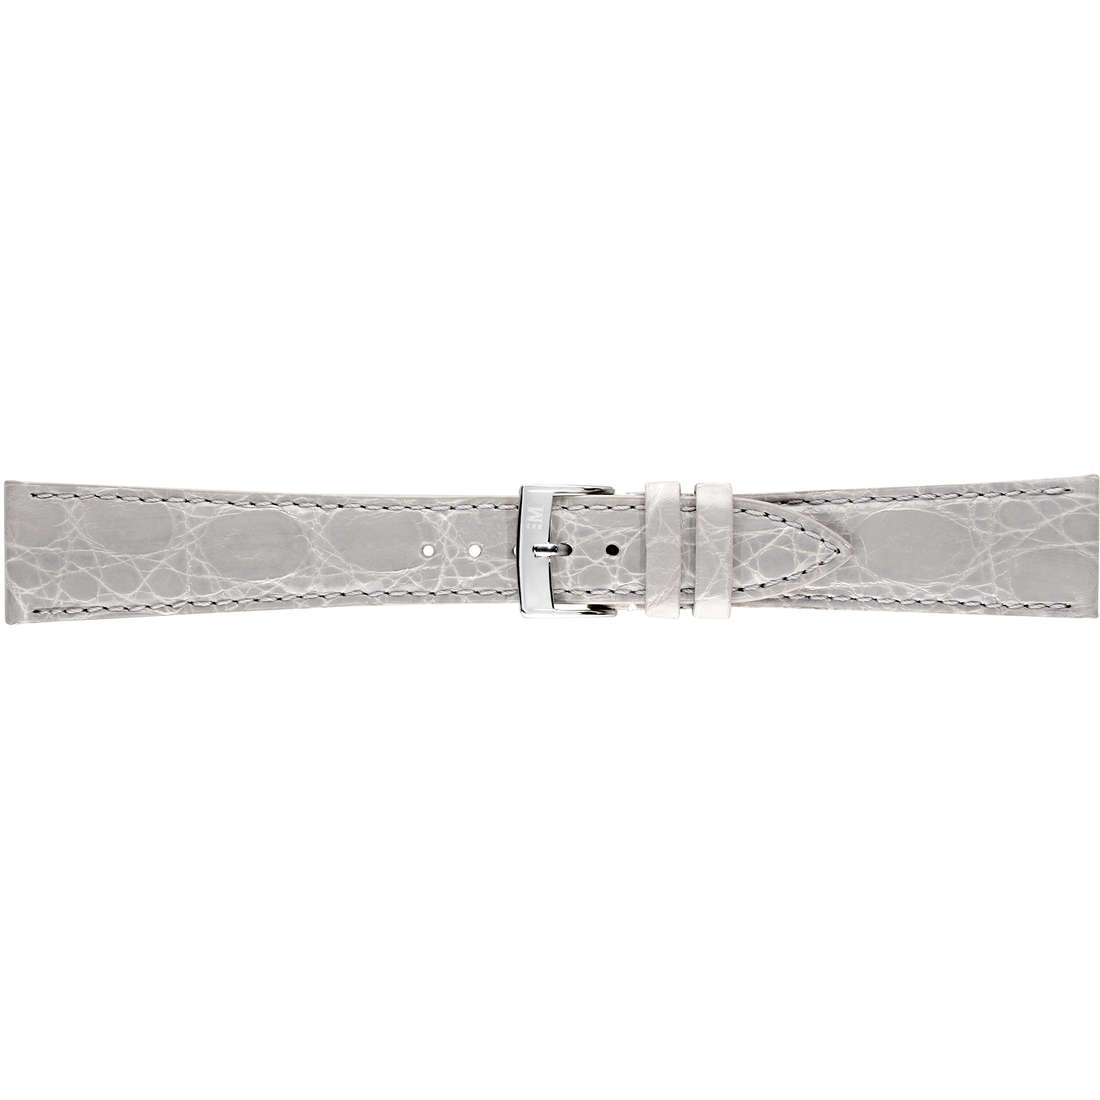 watch watch bands watch straps man Morellato Pelli Preziose A01X2197052093CR14